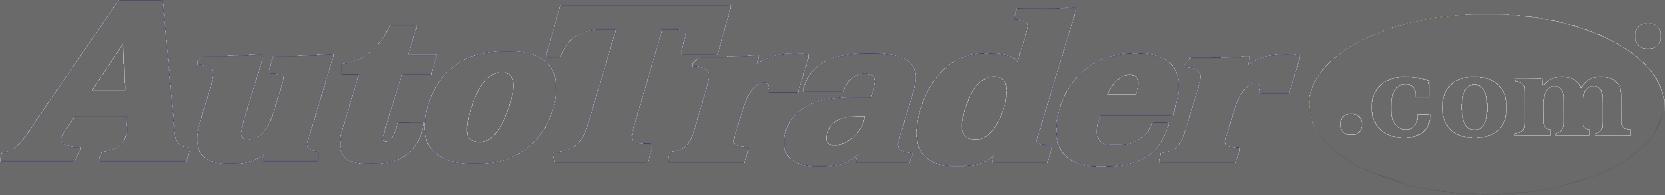 auto trader image